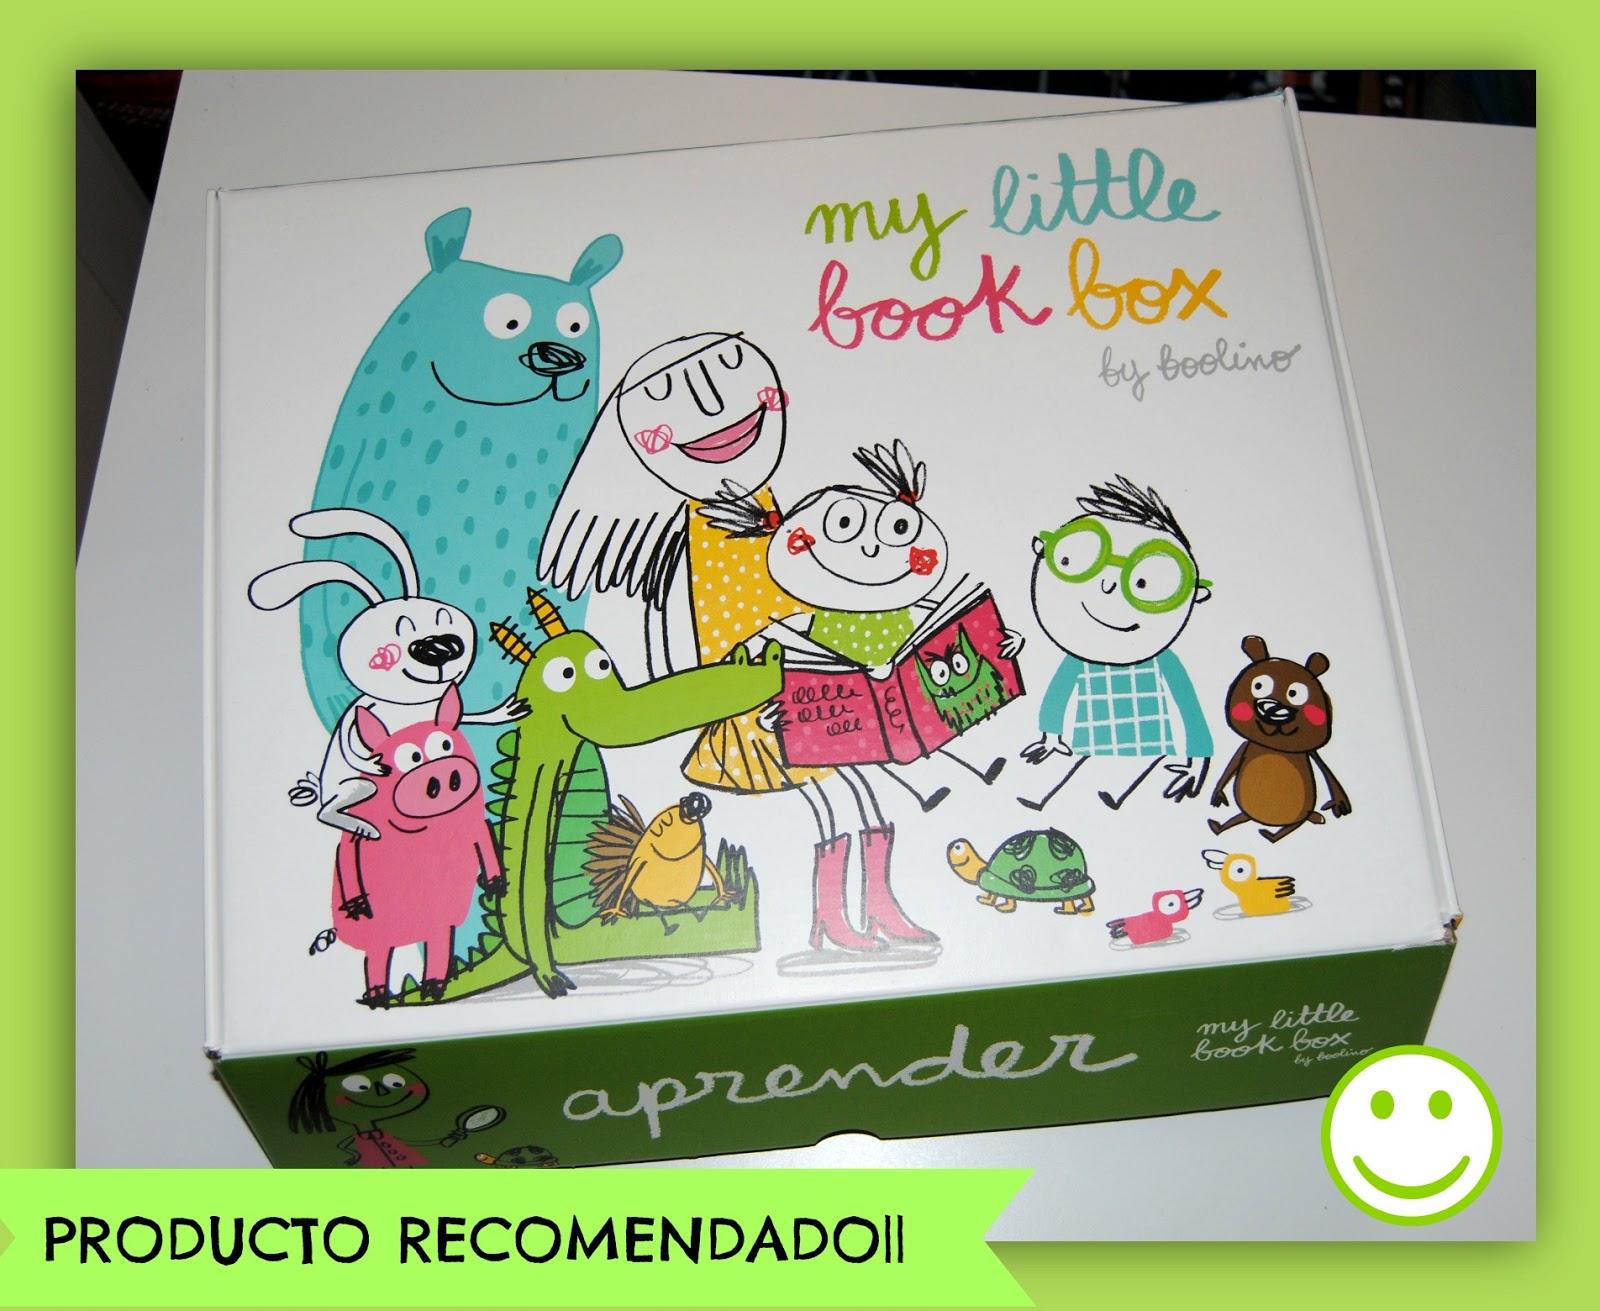 81a819b99e Pero ¿qué es My little book box